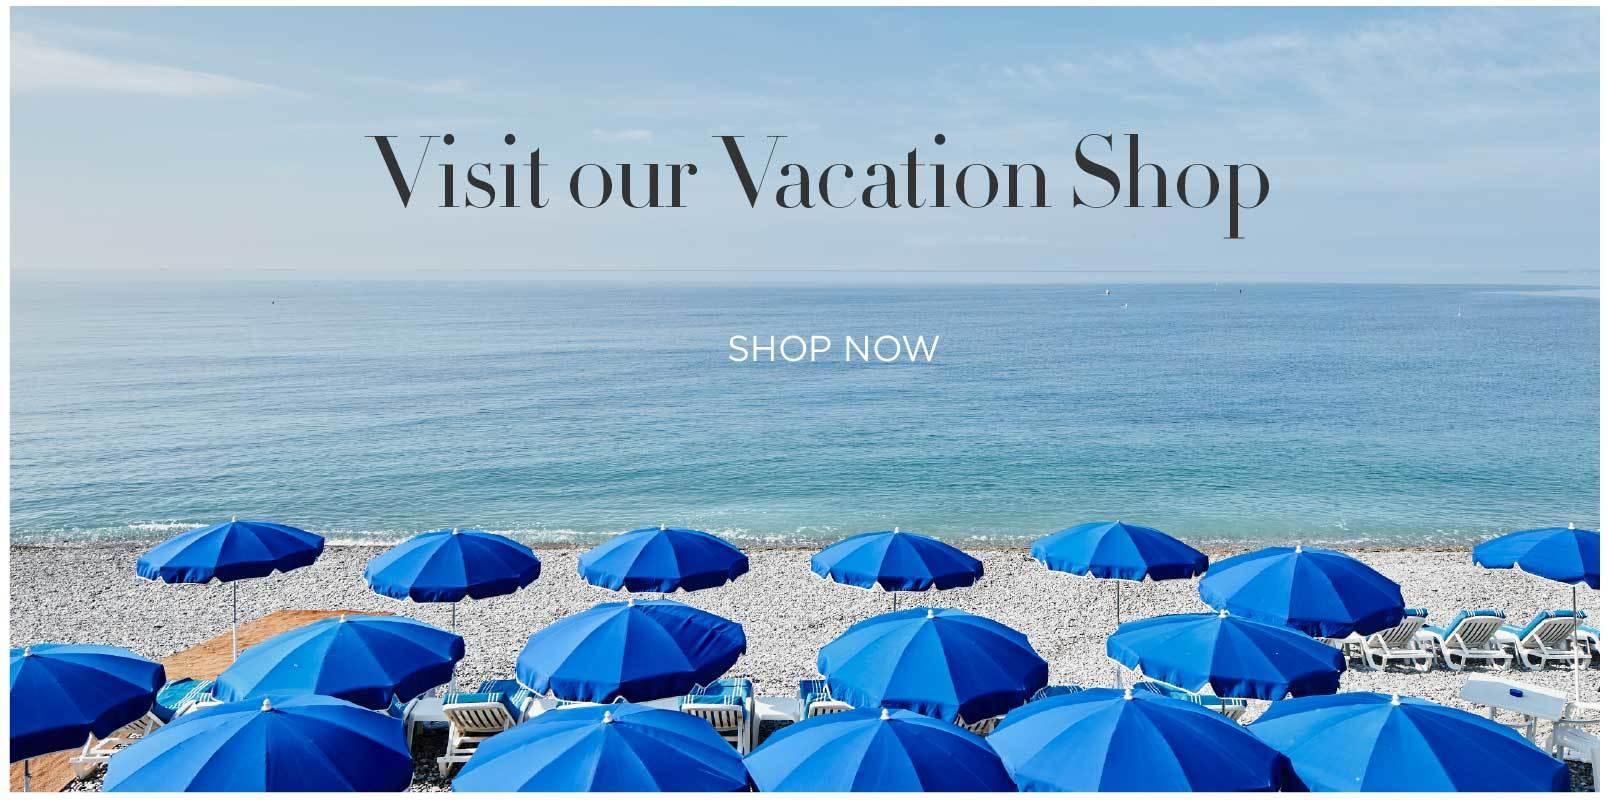 Visit our Vacation Shop